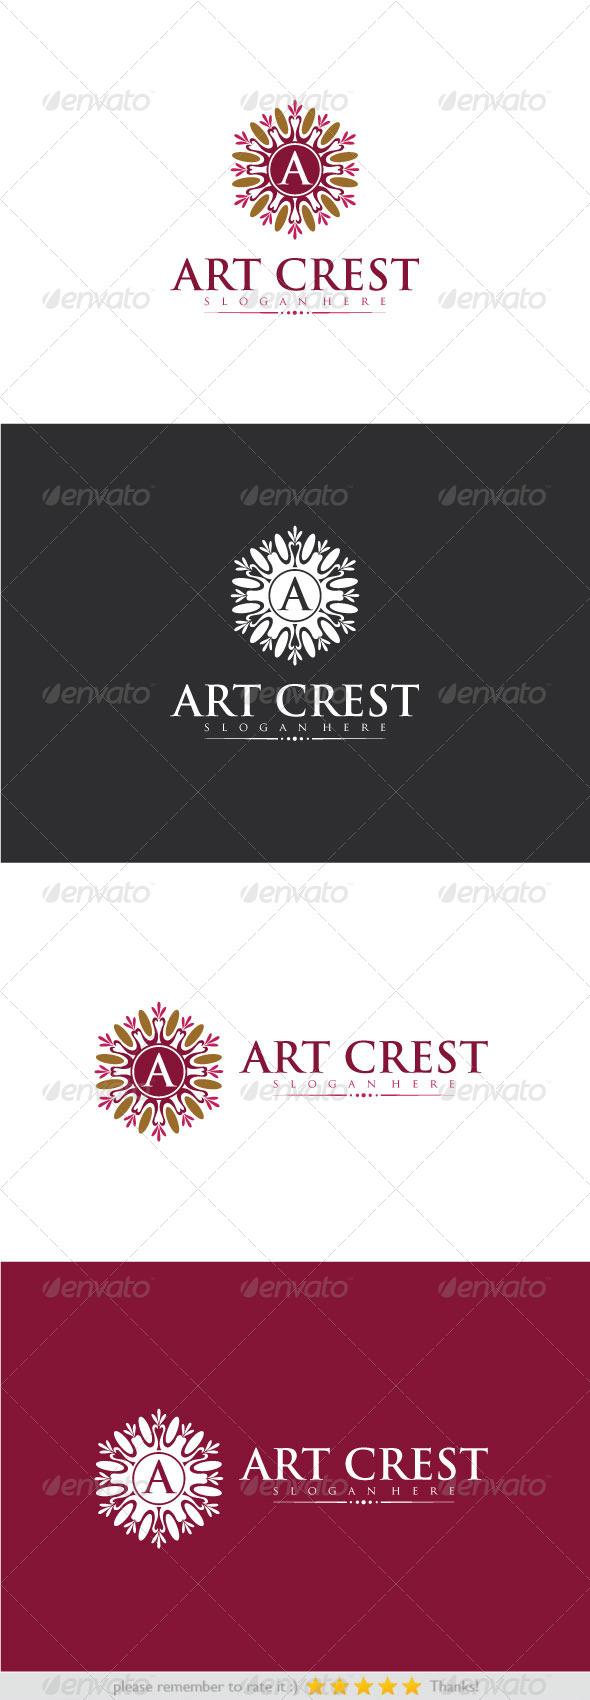 GraphicRiver Art Crest 8286436